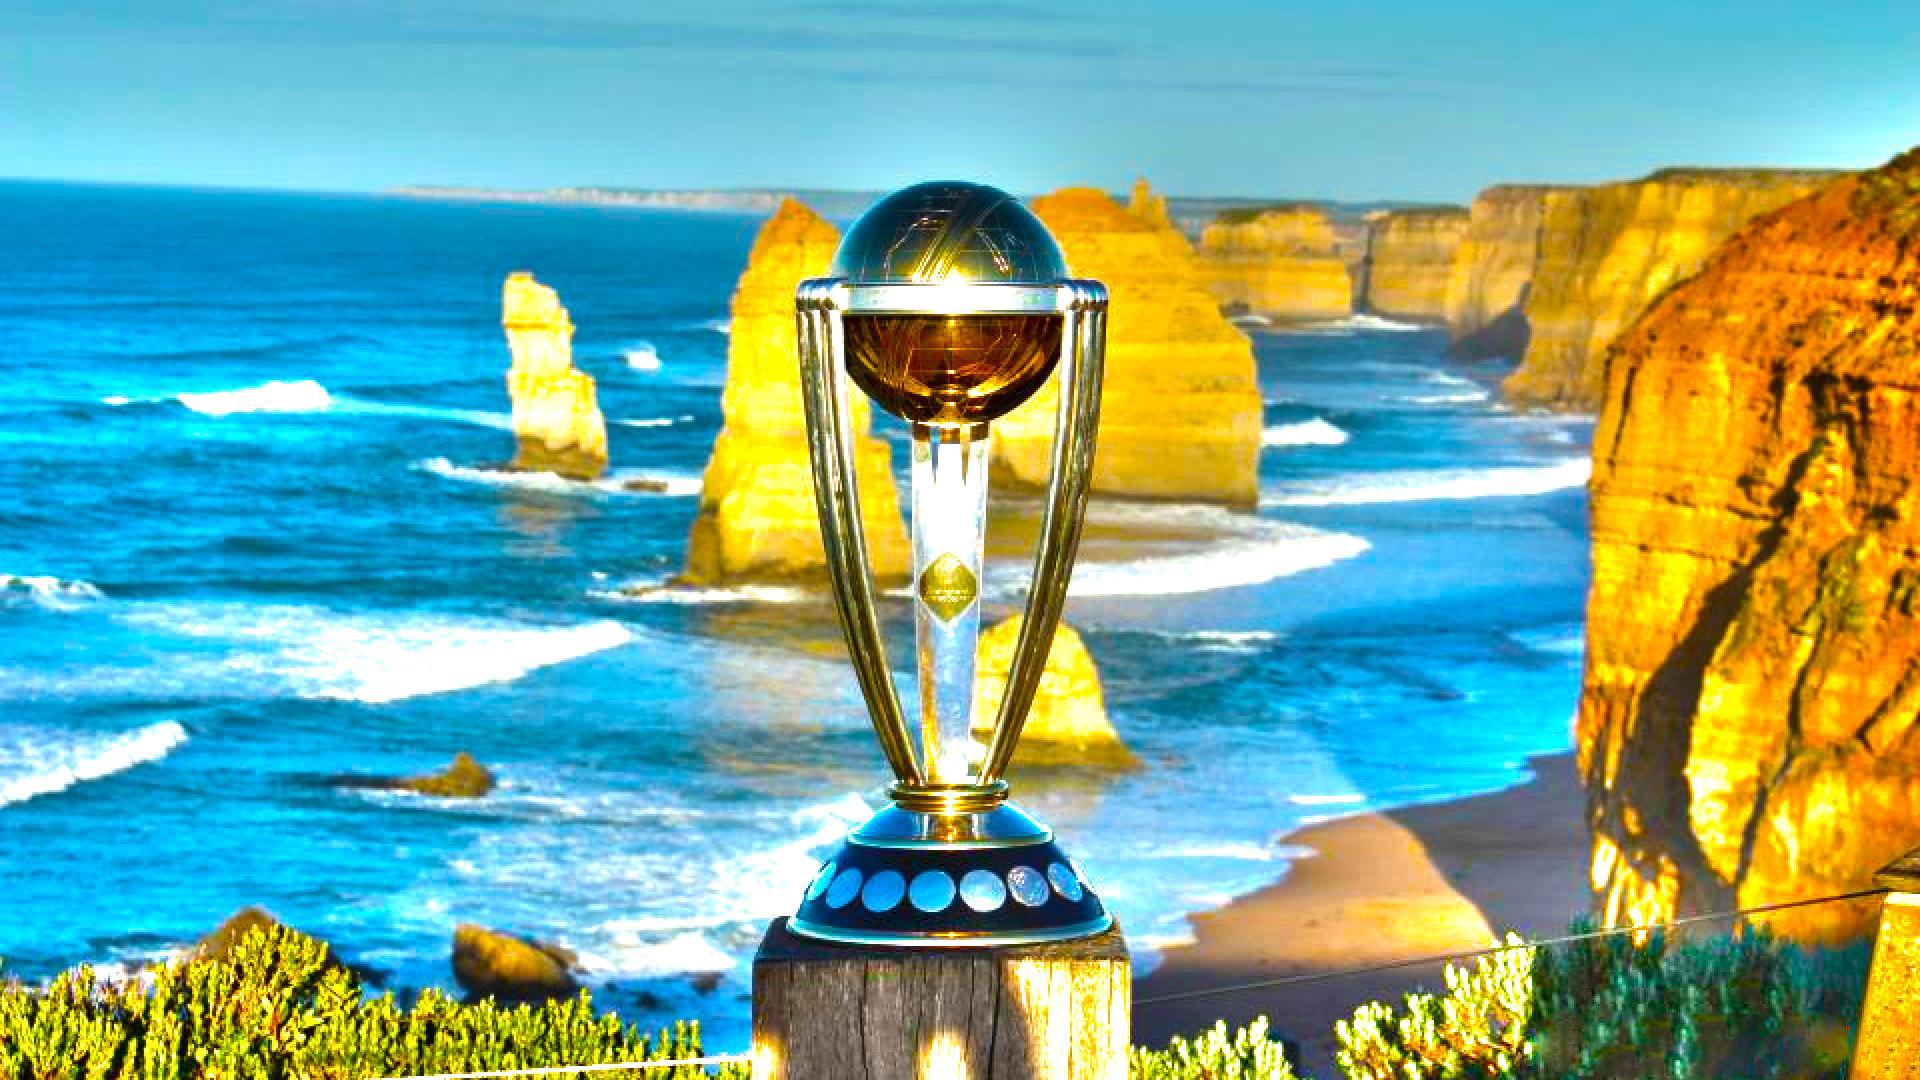 Icc Cricket World Cup 2015 Trophy Wallpaper Cricket World Cup 2019 Hd 1920x1080 Wallpaper Teahub Io